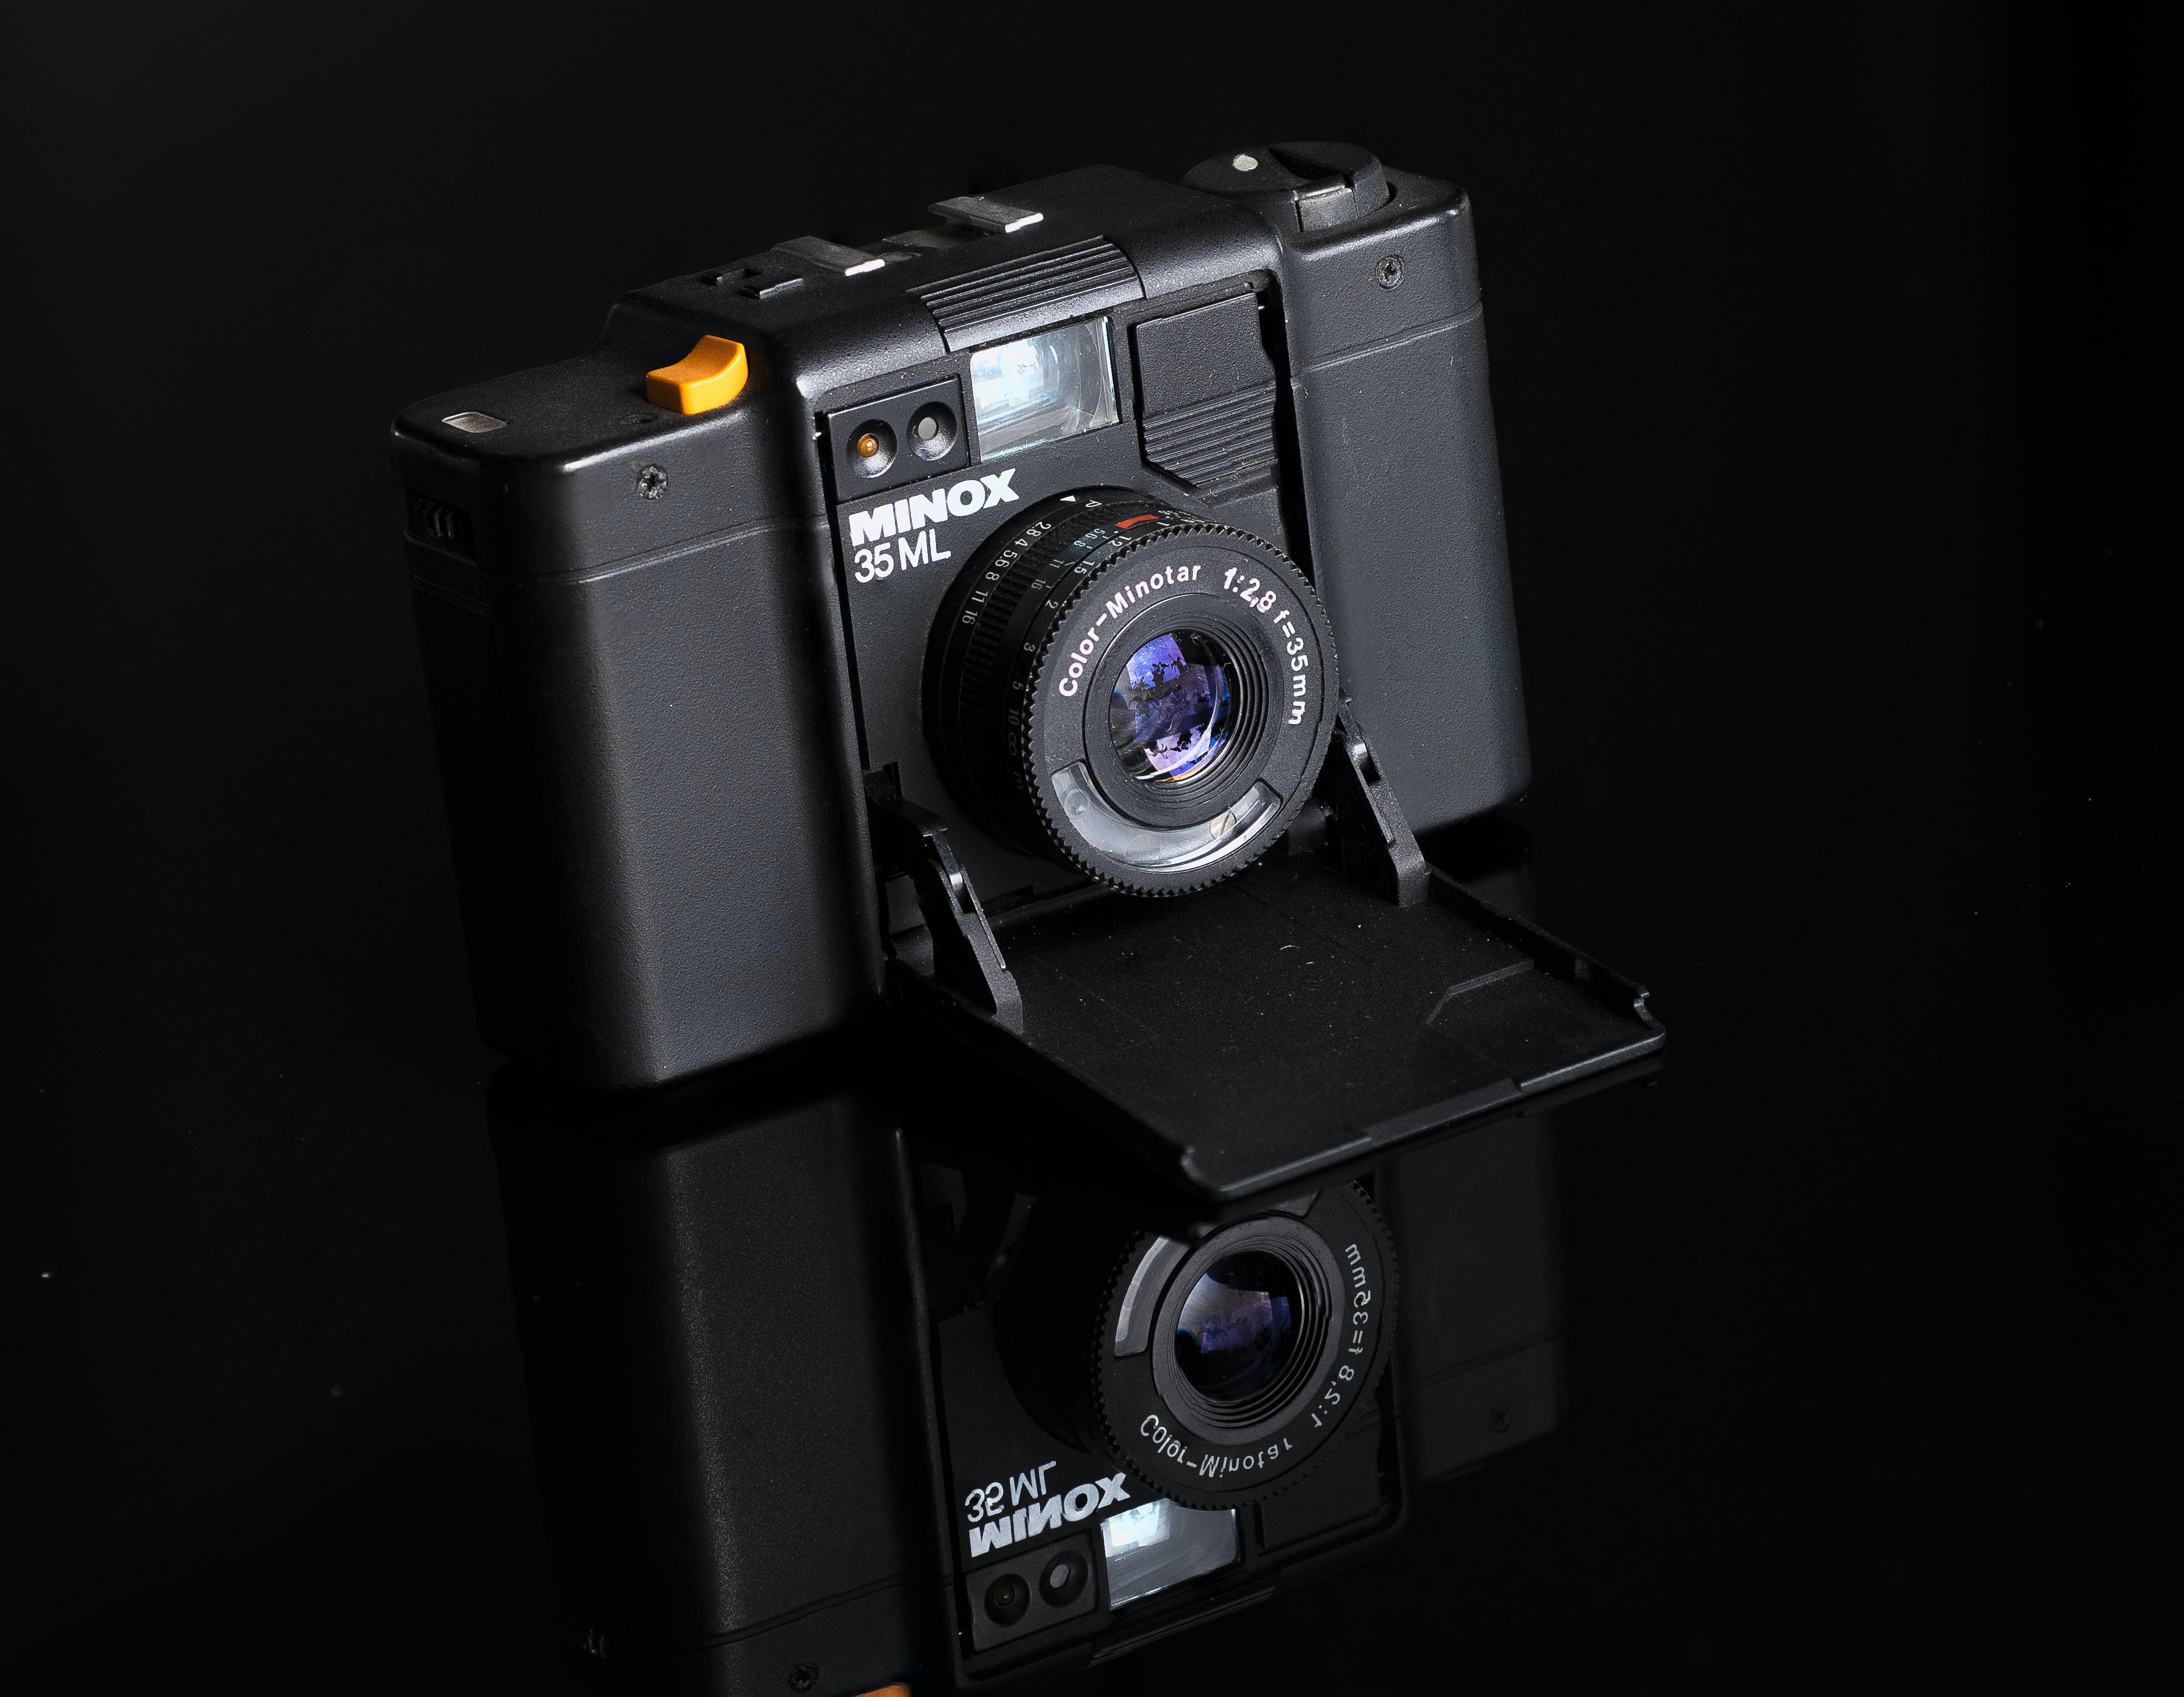 Black Minox 35 Ml Camera